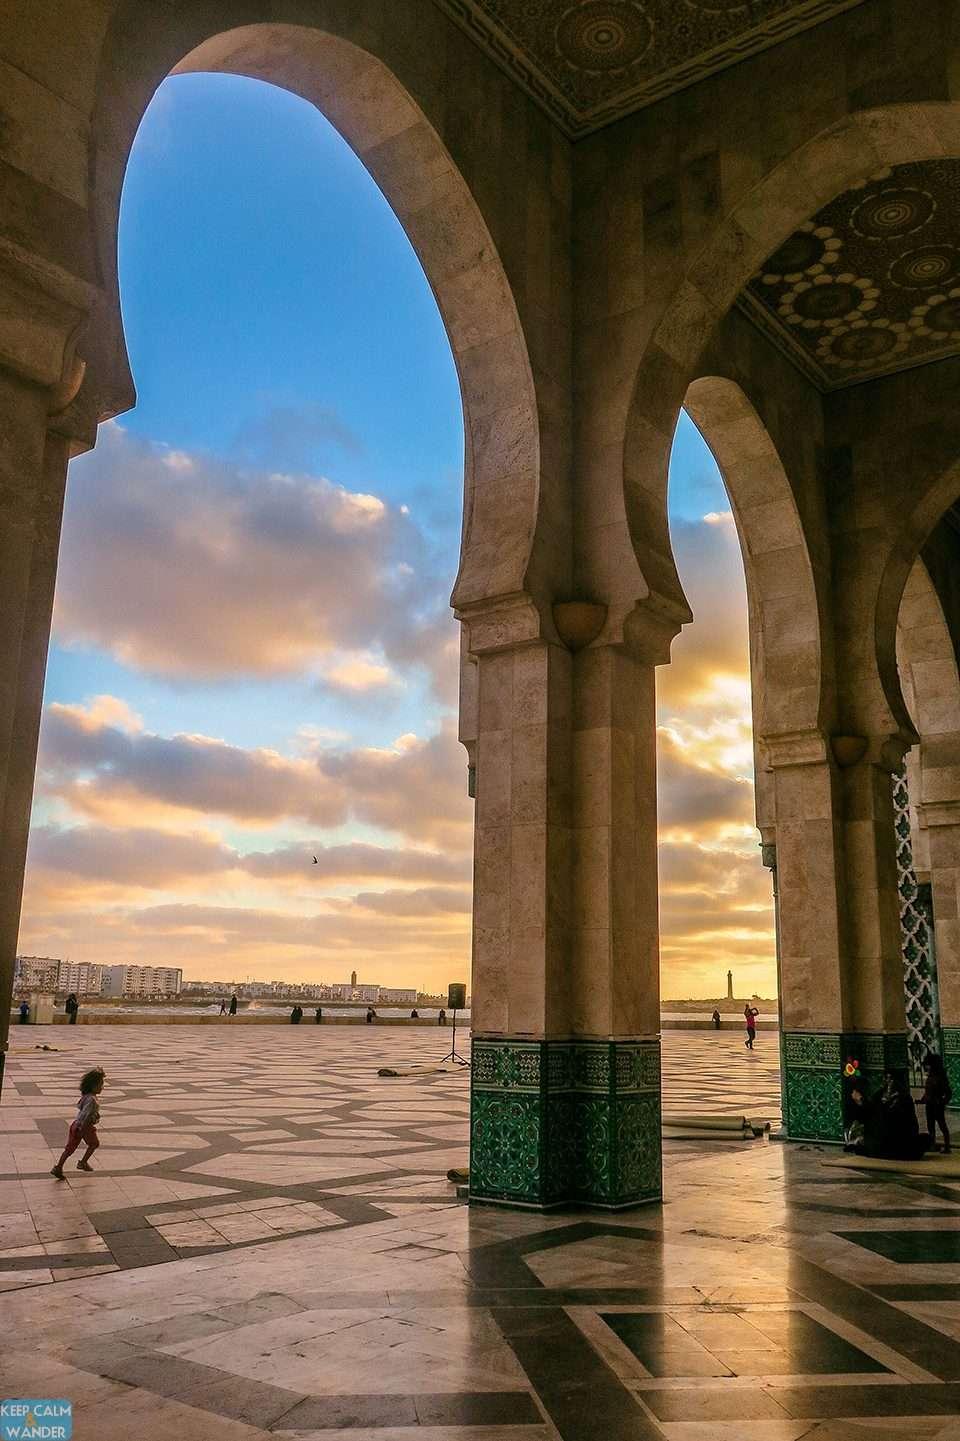 Casablanca's sunset is breathtakingly gorgeous.